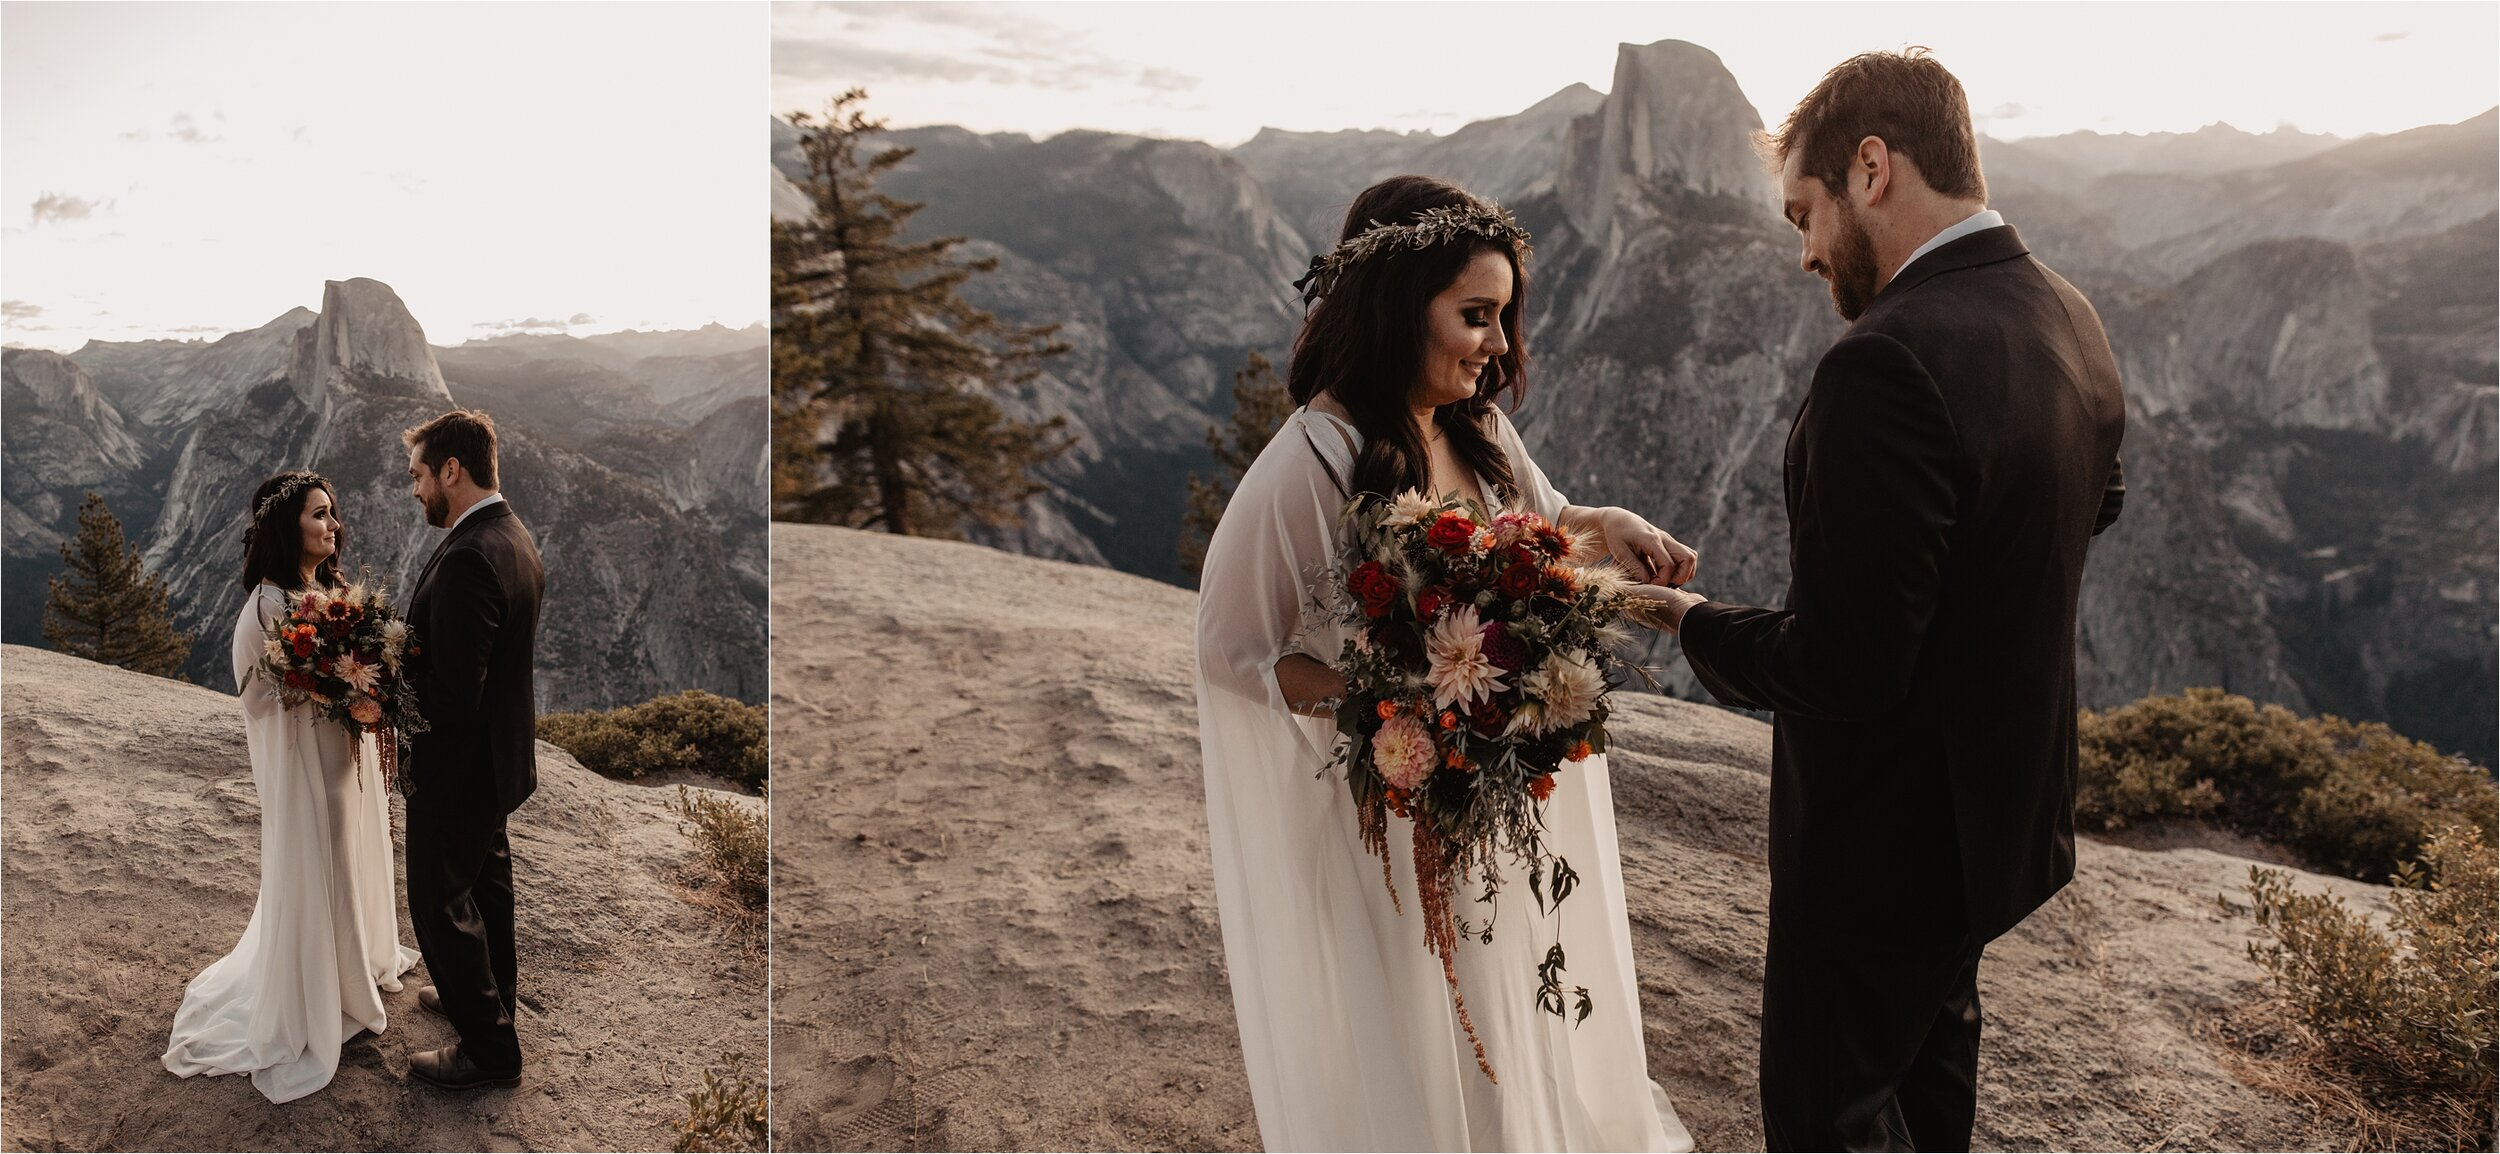 glacier-point-yosemite-elopement-ceremony_0016.jpg